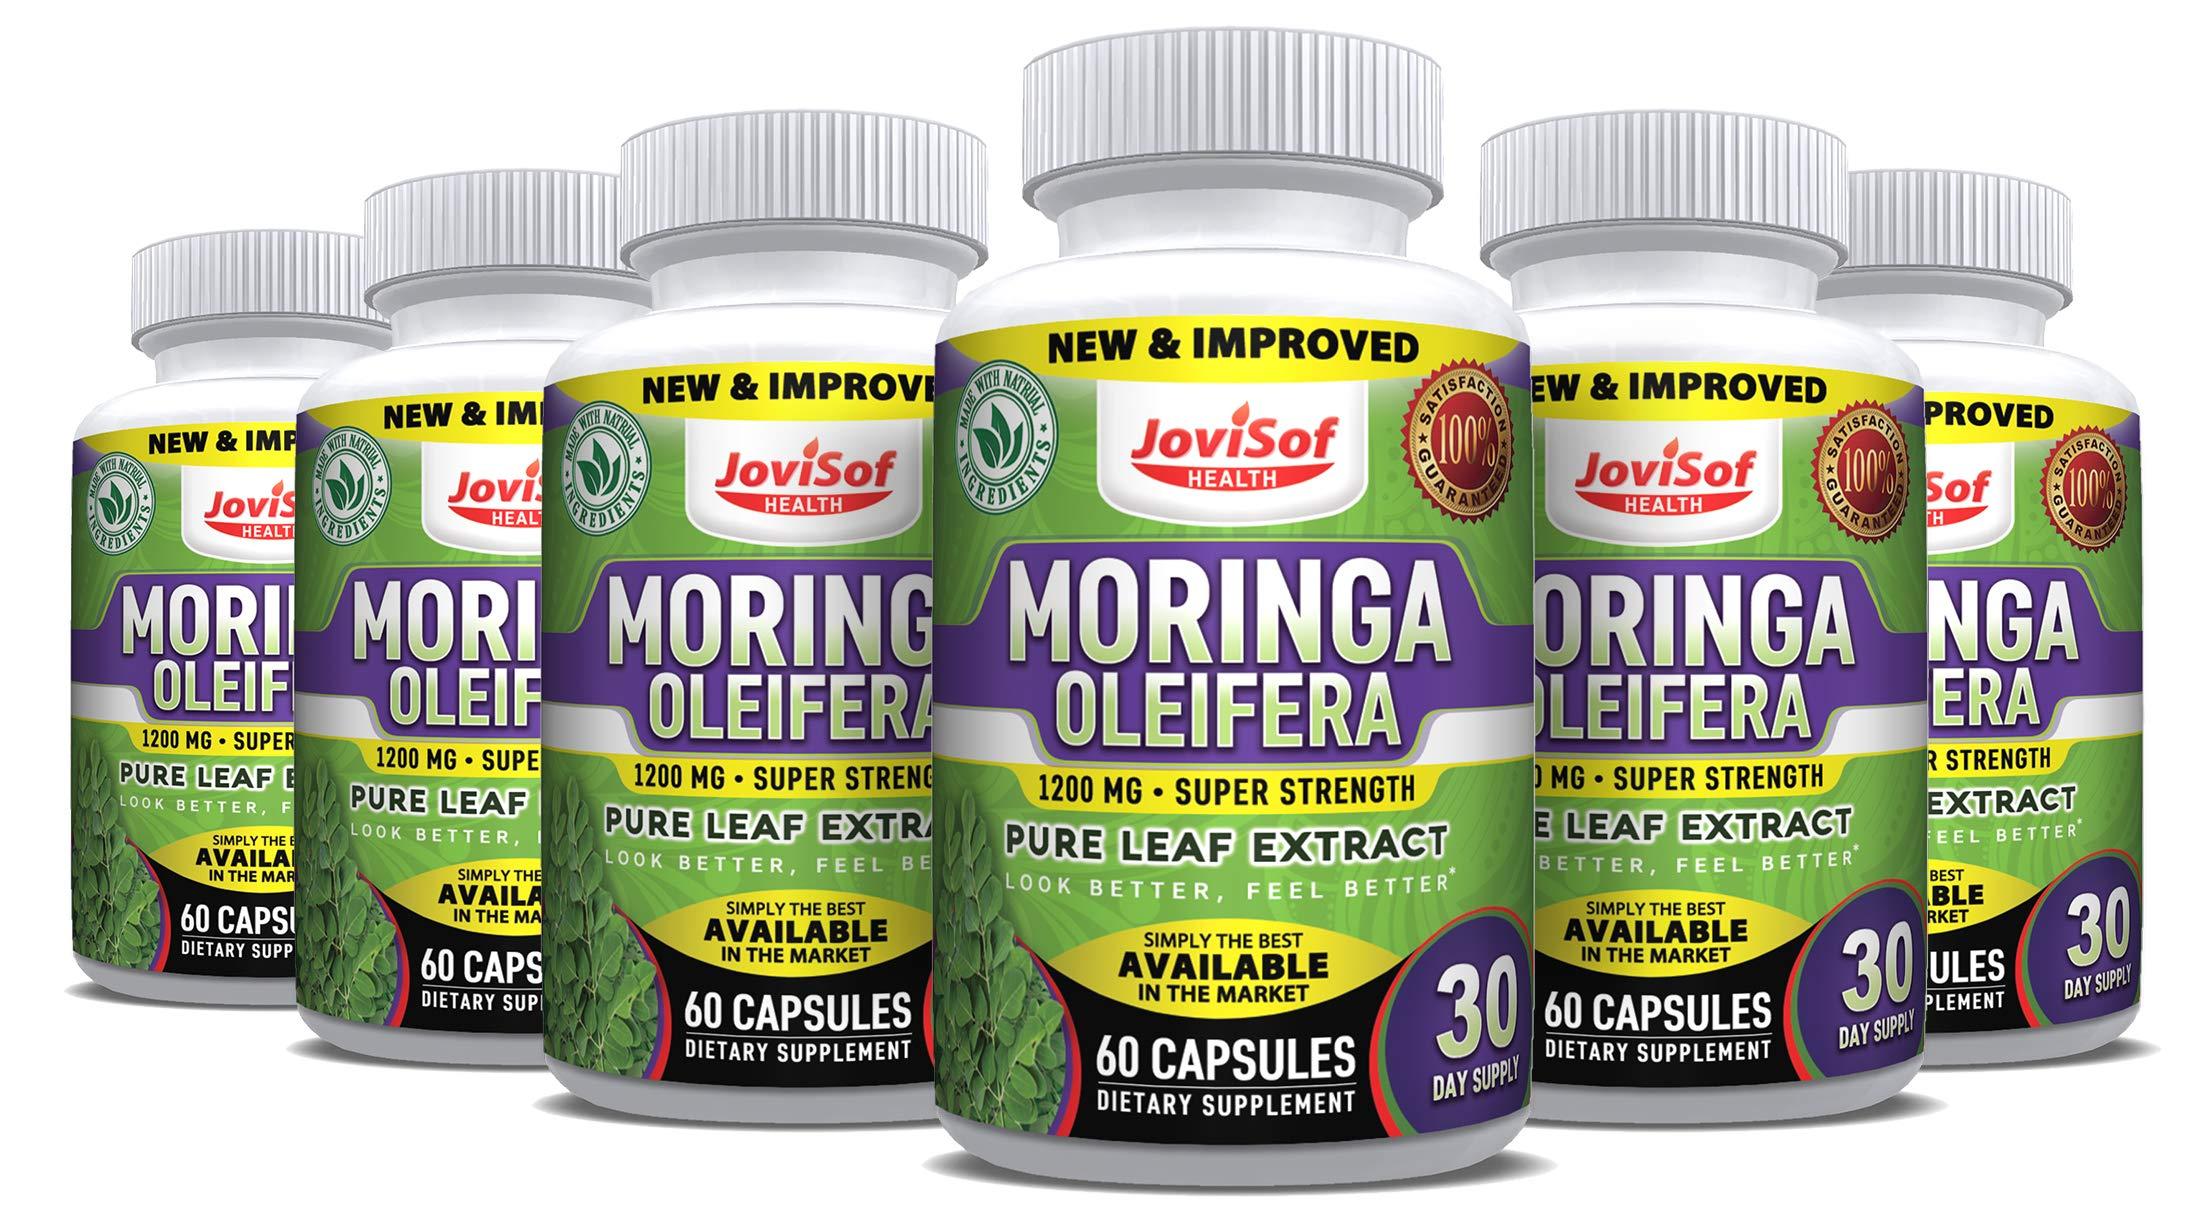 6 Pack Extra Strong 1200mg Moringa Buy 4 Get 2 Free Moringa Capsules| 100% Natural Pure Moringa Oleifera Extract| Moringa Pills Skyrocket Energy! Moringa Powder Capsules 360 Capsules -180 Days Supply